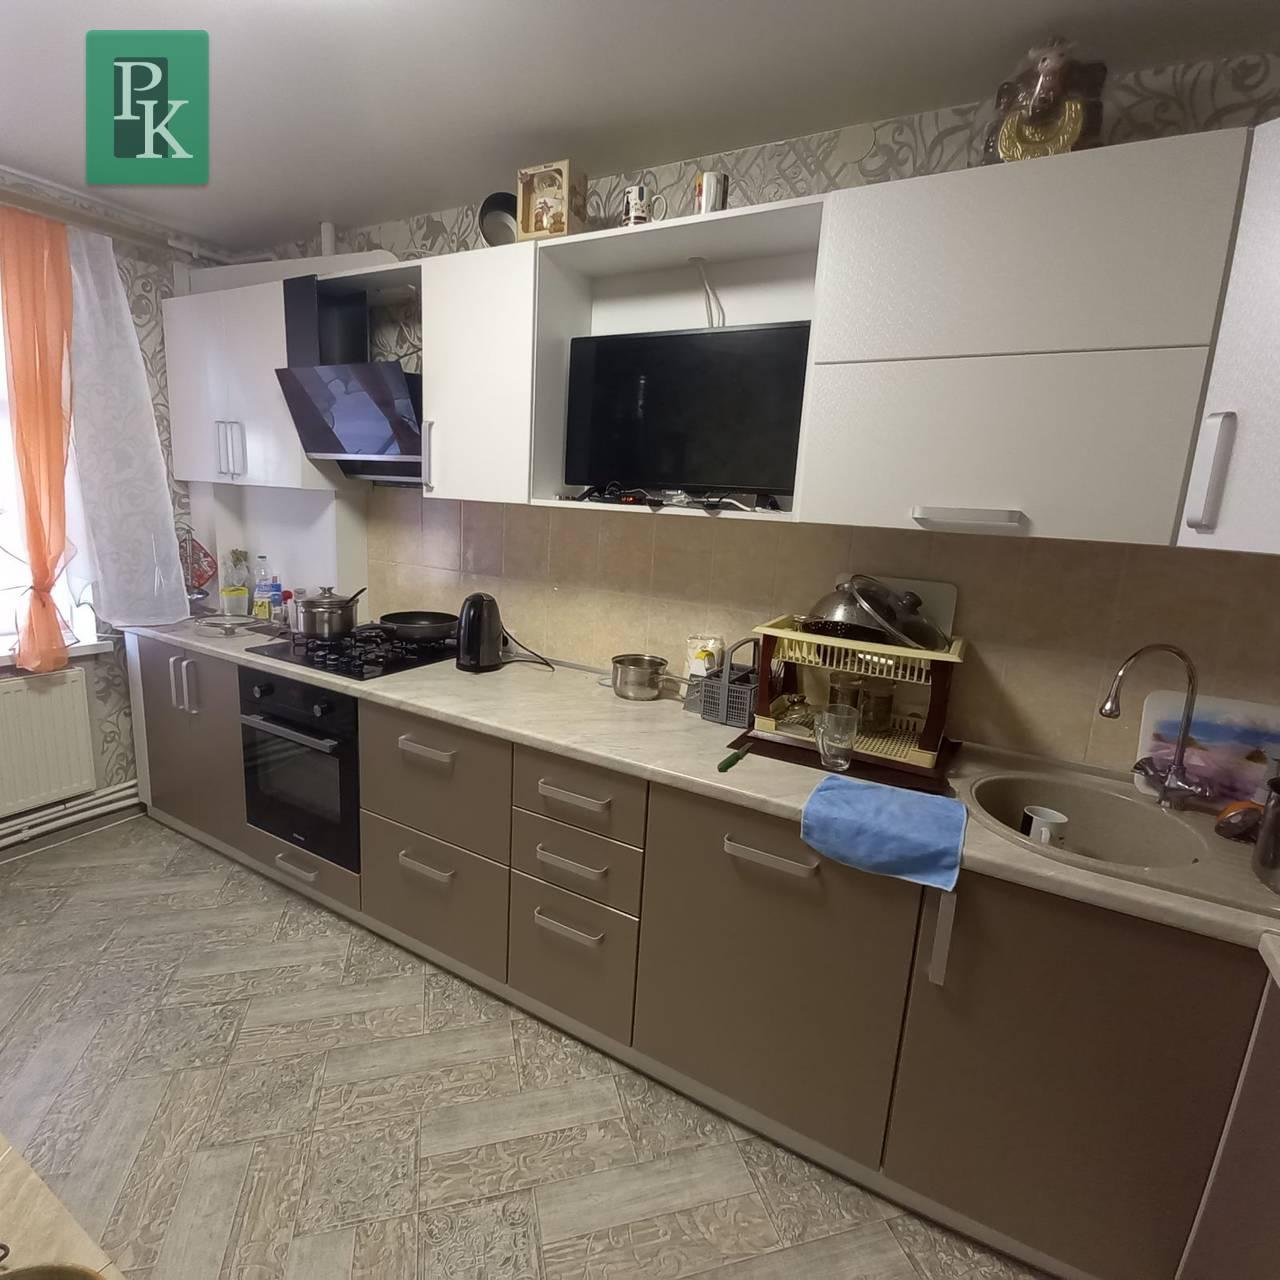 Двухкомнатная квартира по ул.  Комбрига Потапова, д 24